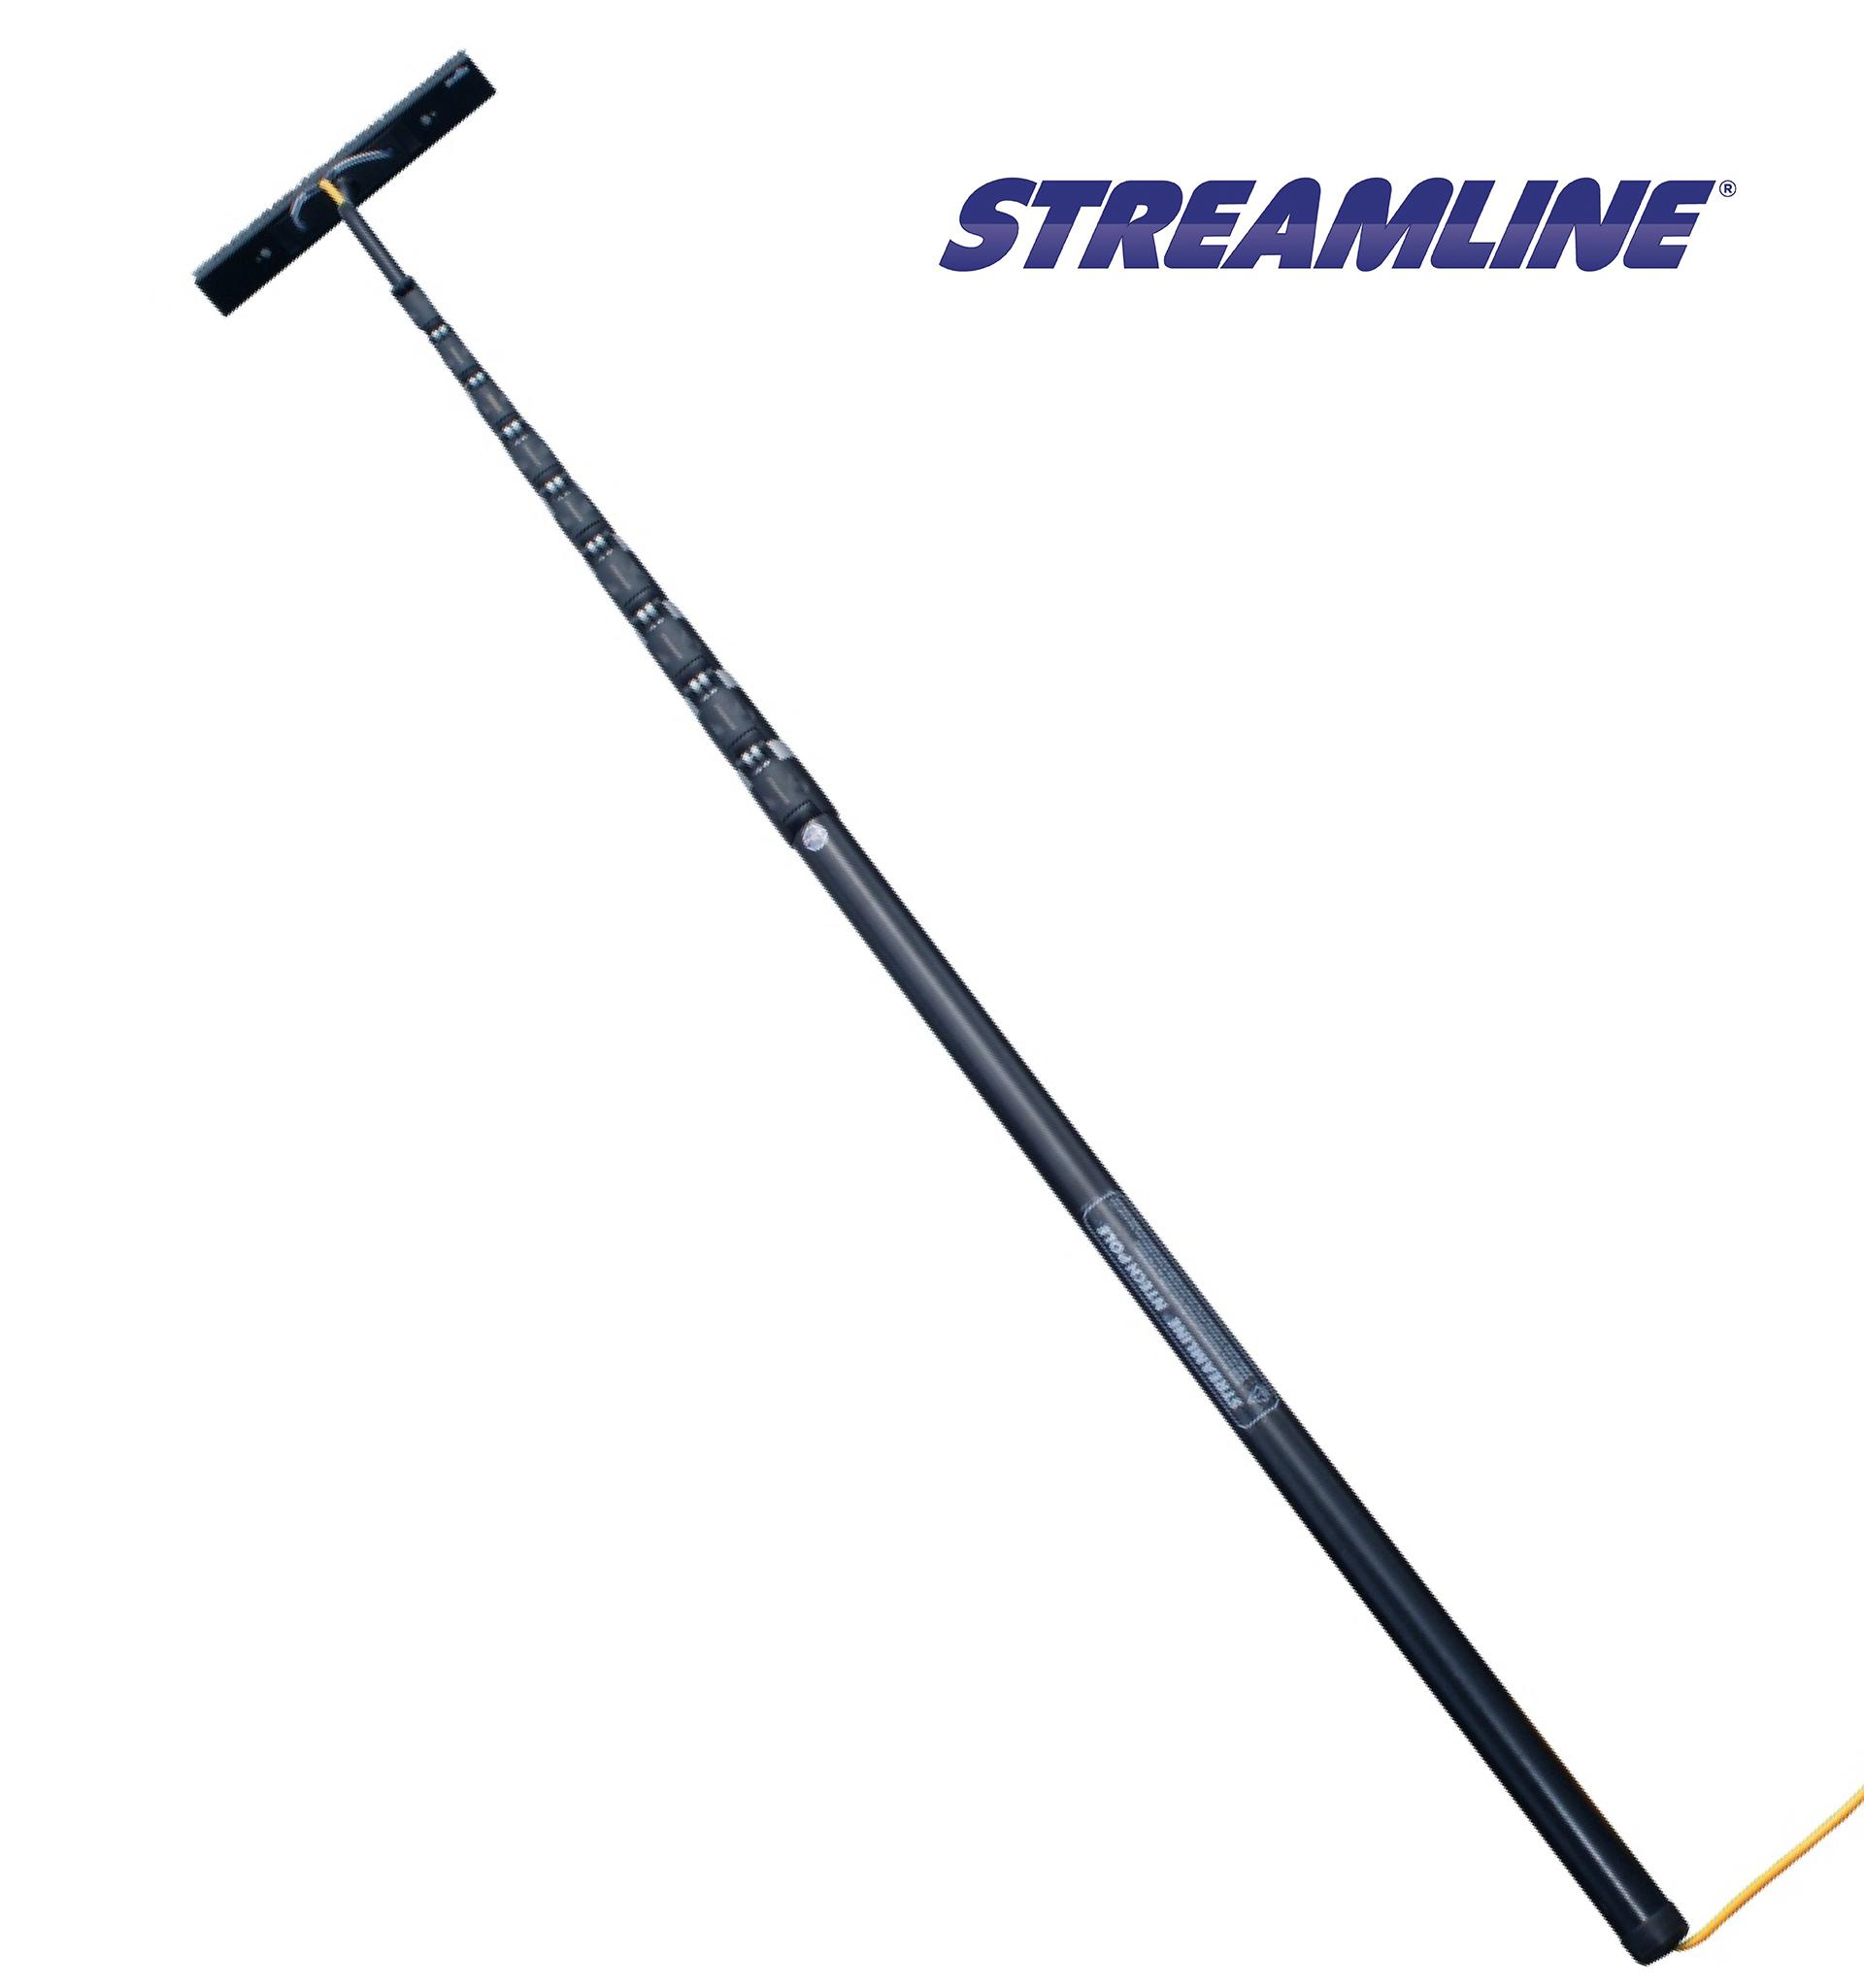 Streamline CXTEL 14 Metres (45′) 100% Carbon Fibre Telescopic Pole